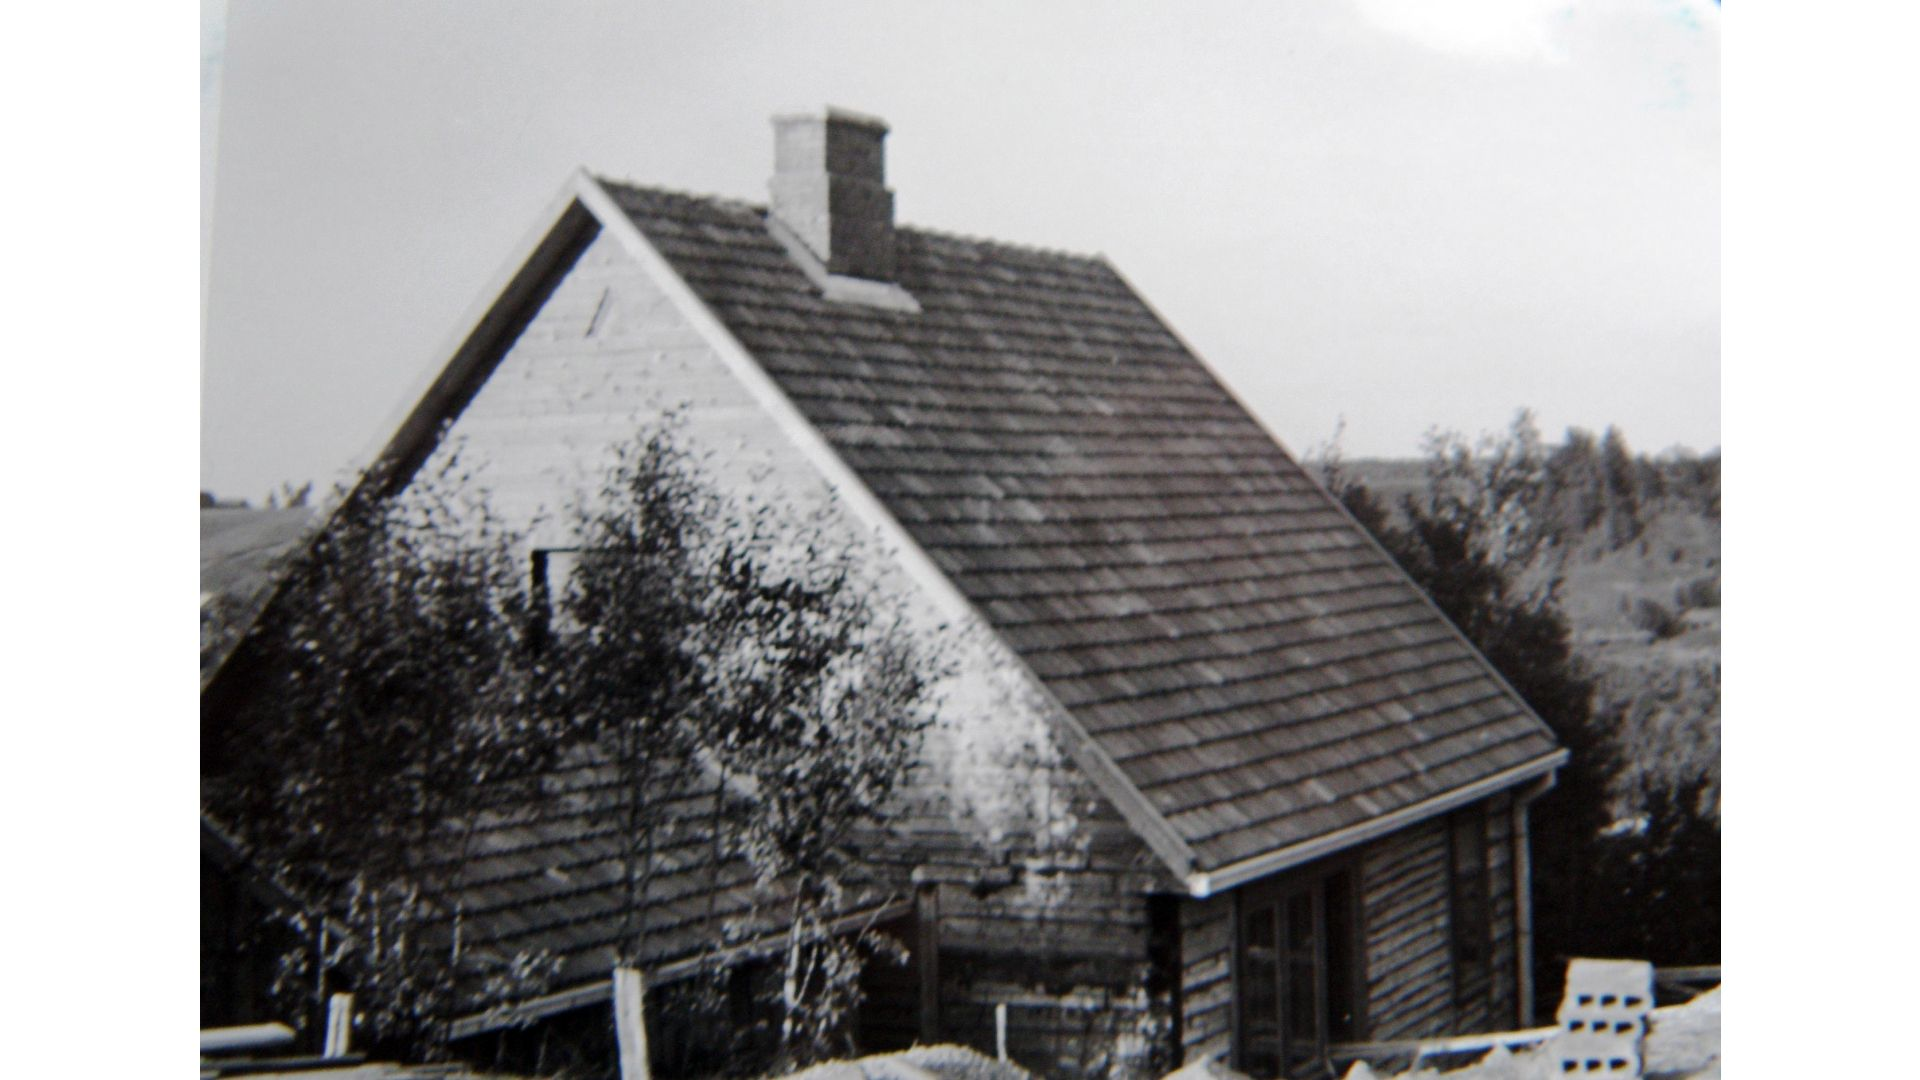 kazio borutos namas istorine